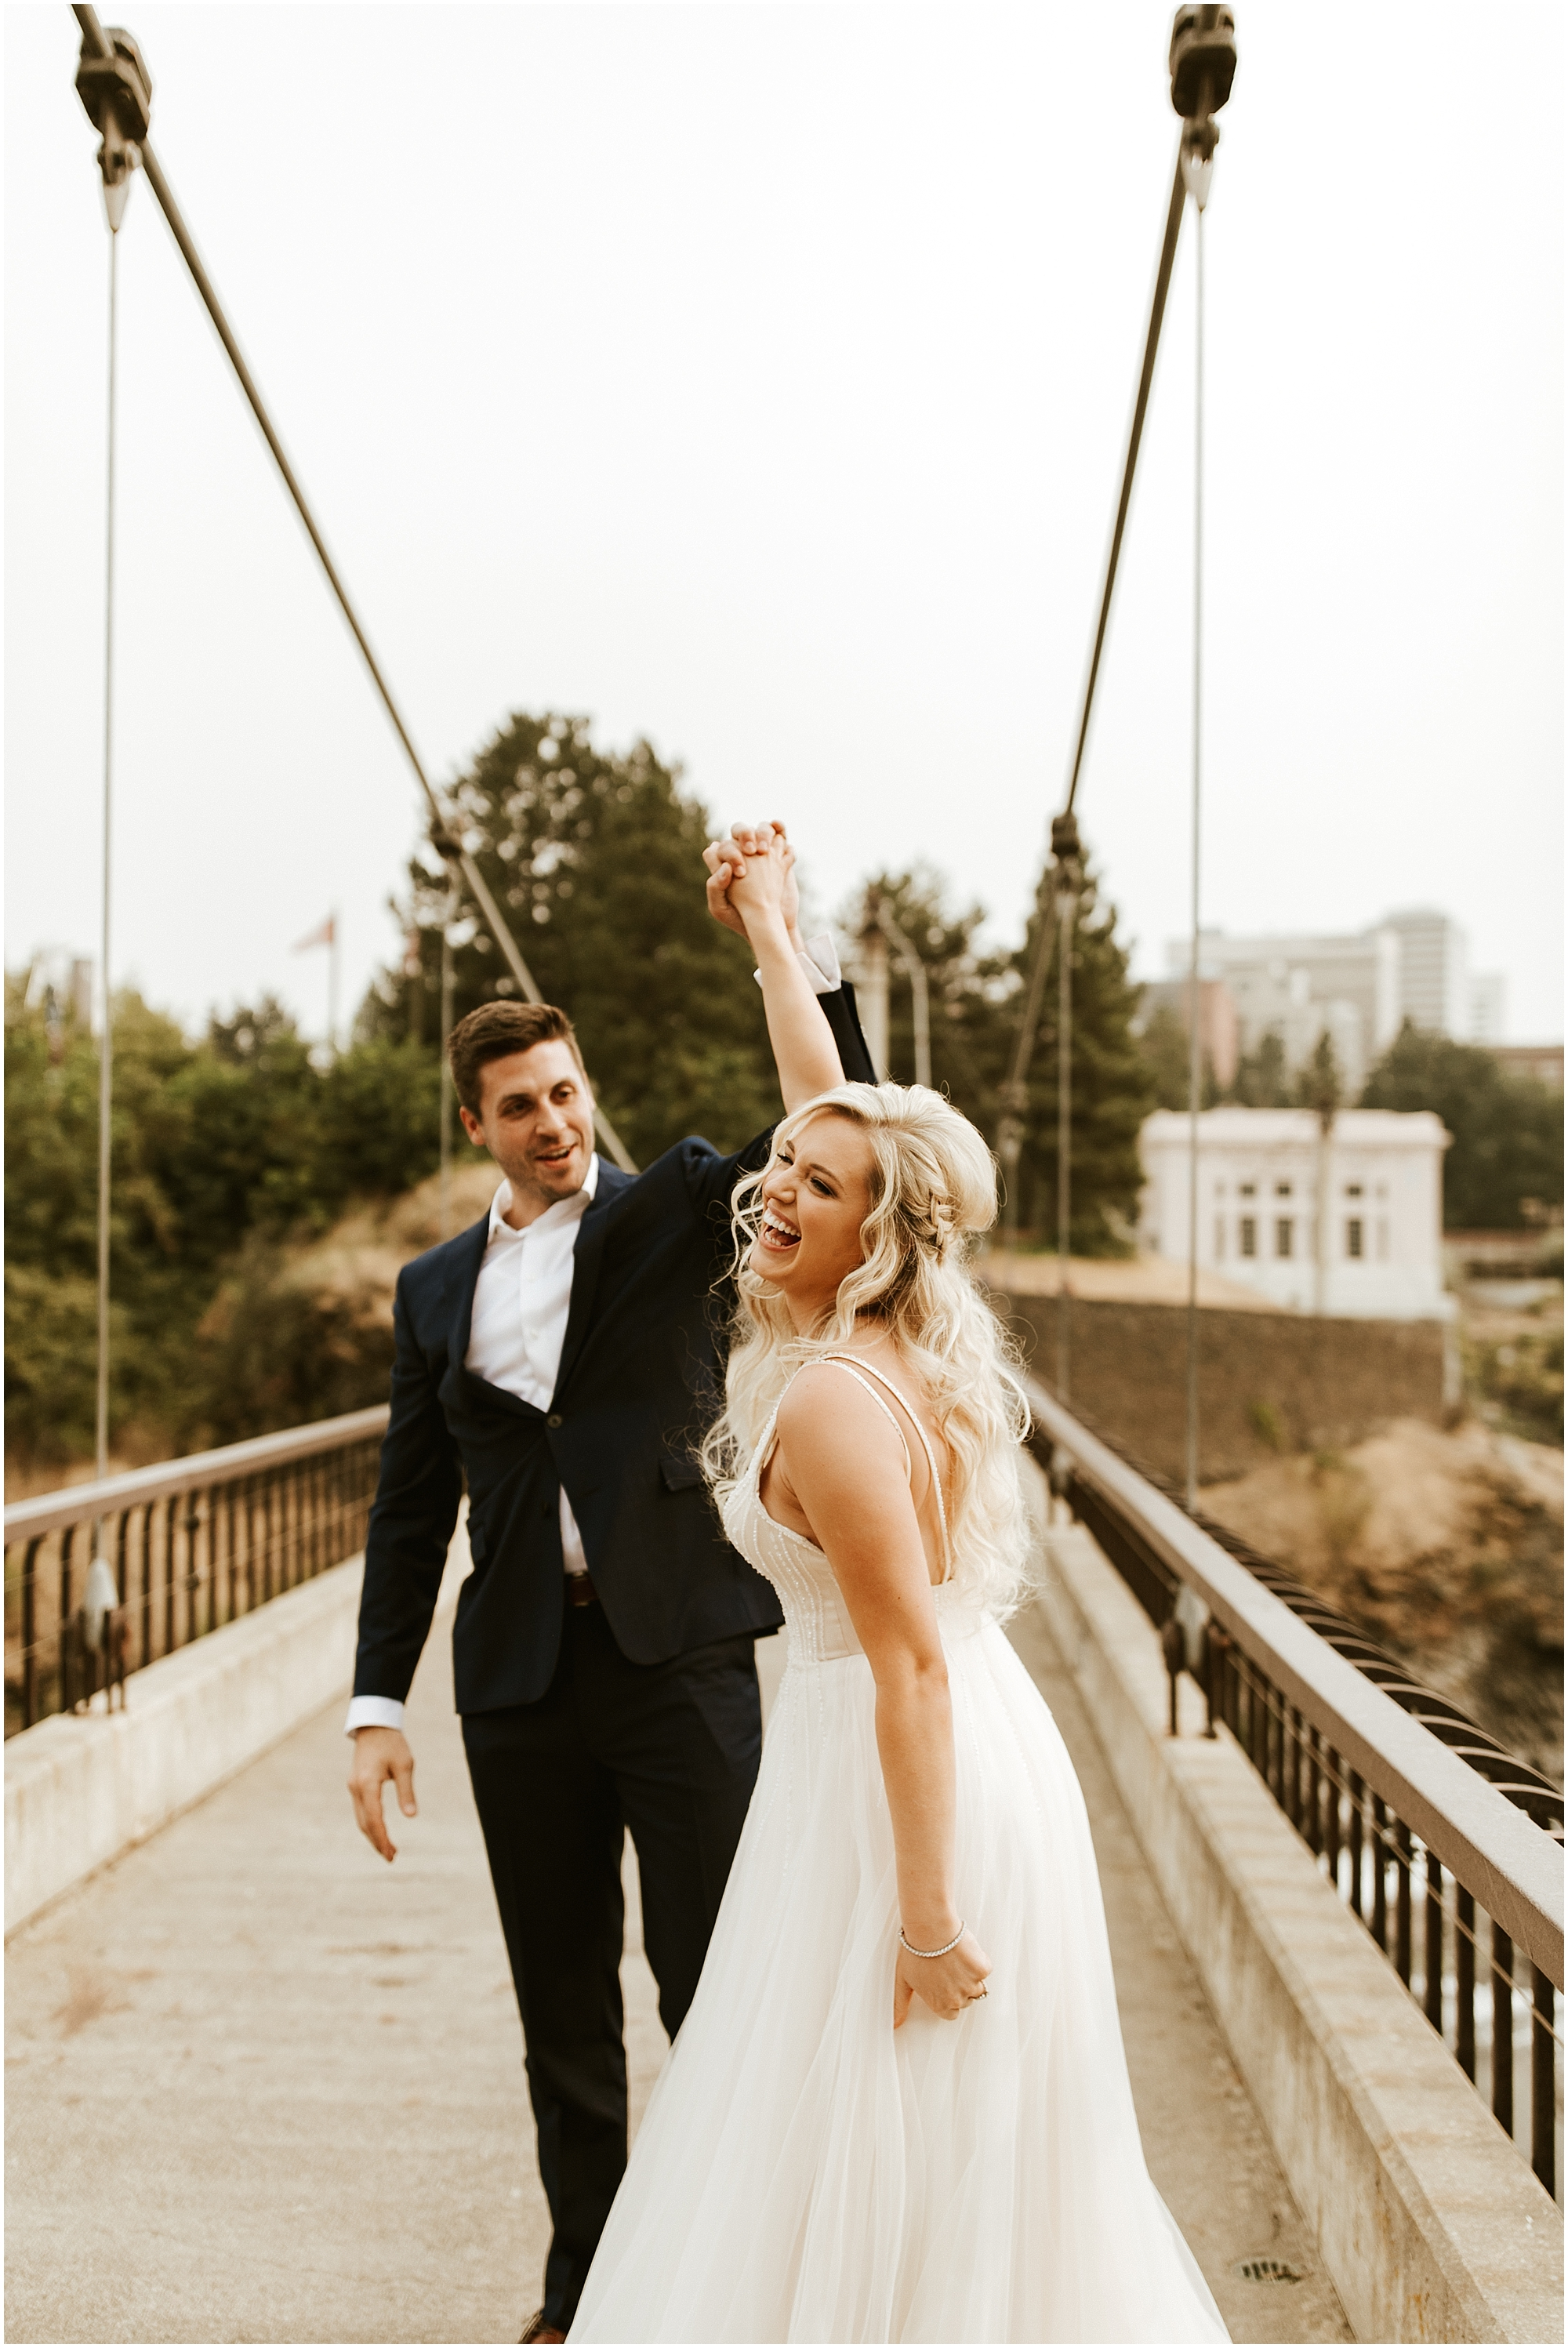 Chateau Rive Spokane Wedding Cassie Trottier Photography1038.jpg